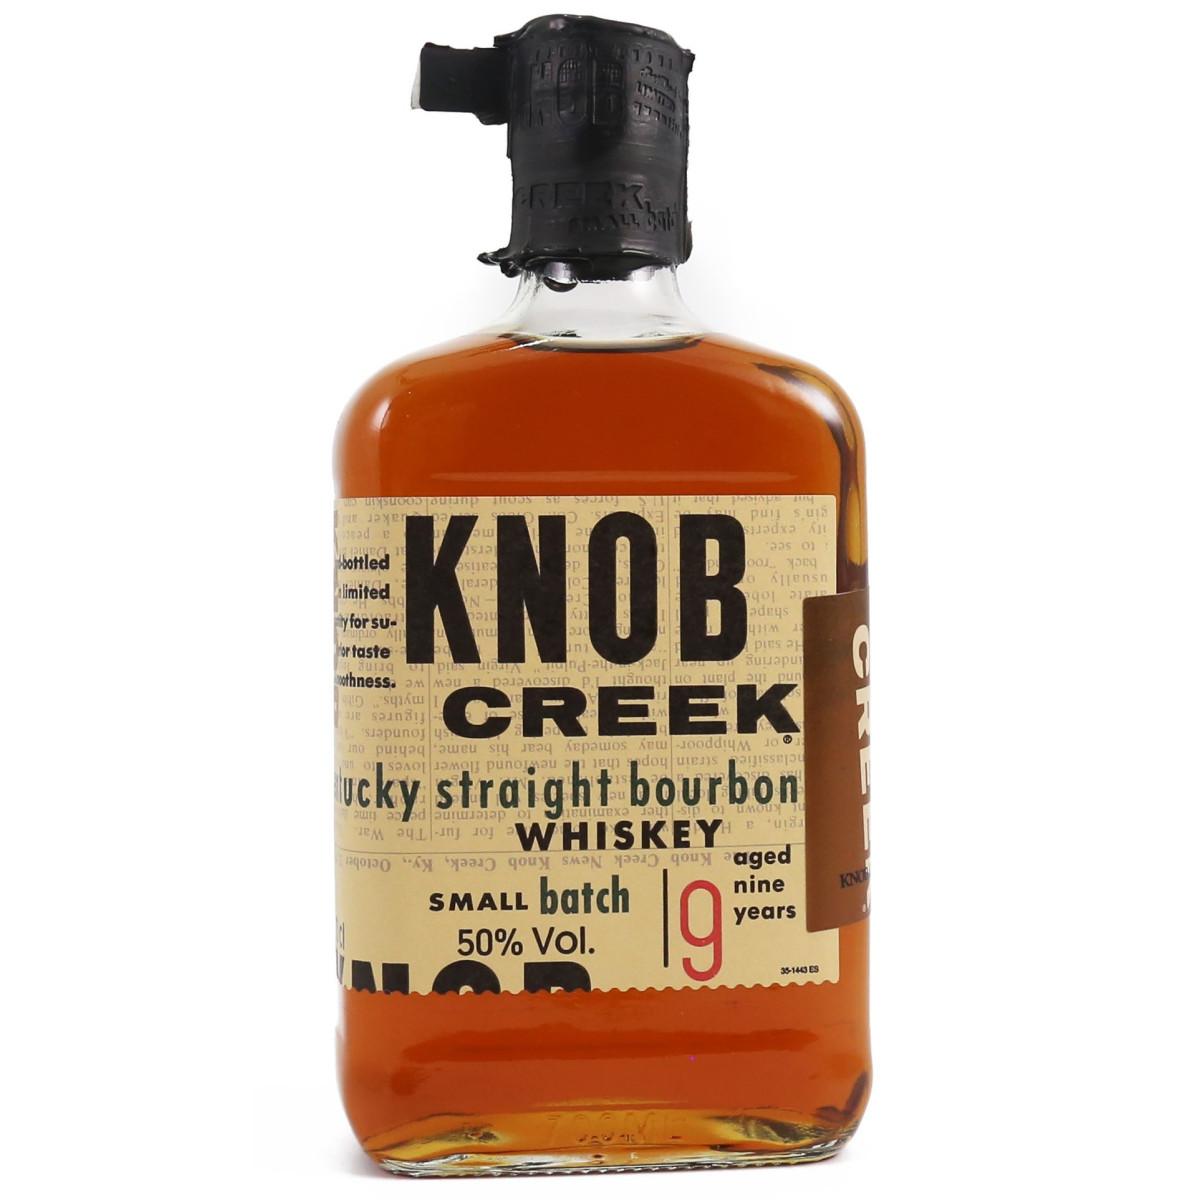 Knob Creek 9 Year Old Small Batch - Vintage Liquors